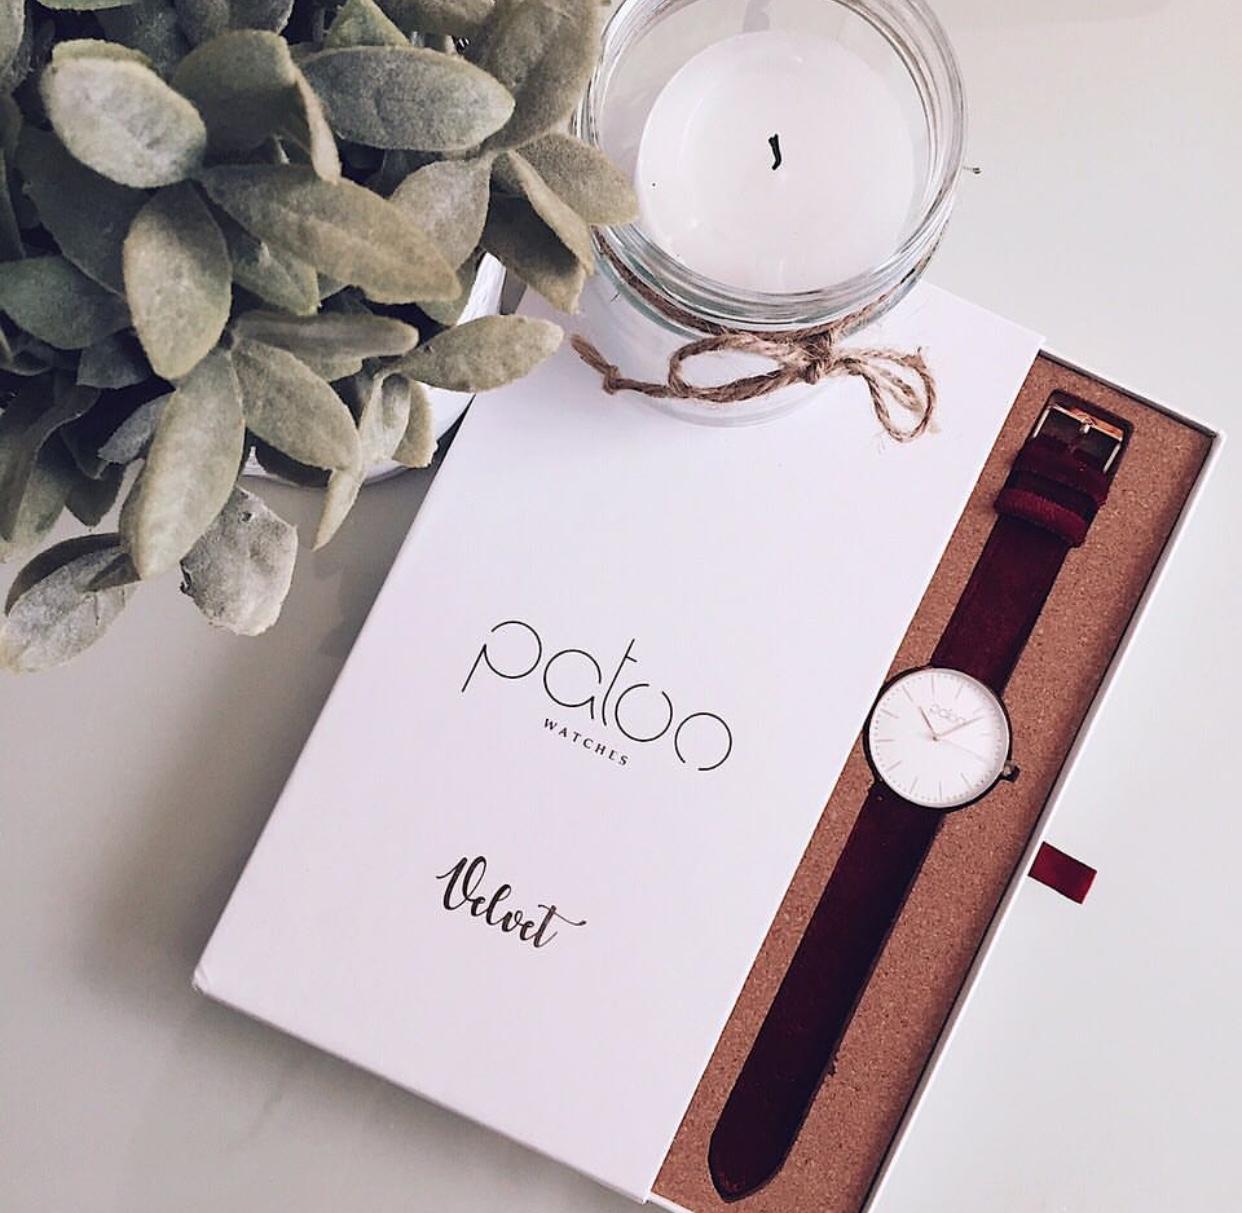 Branding 'Patoo'